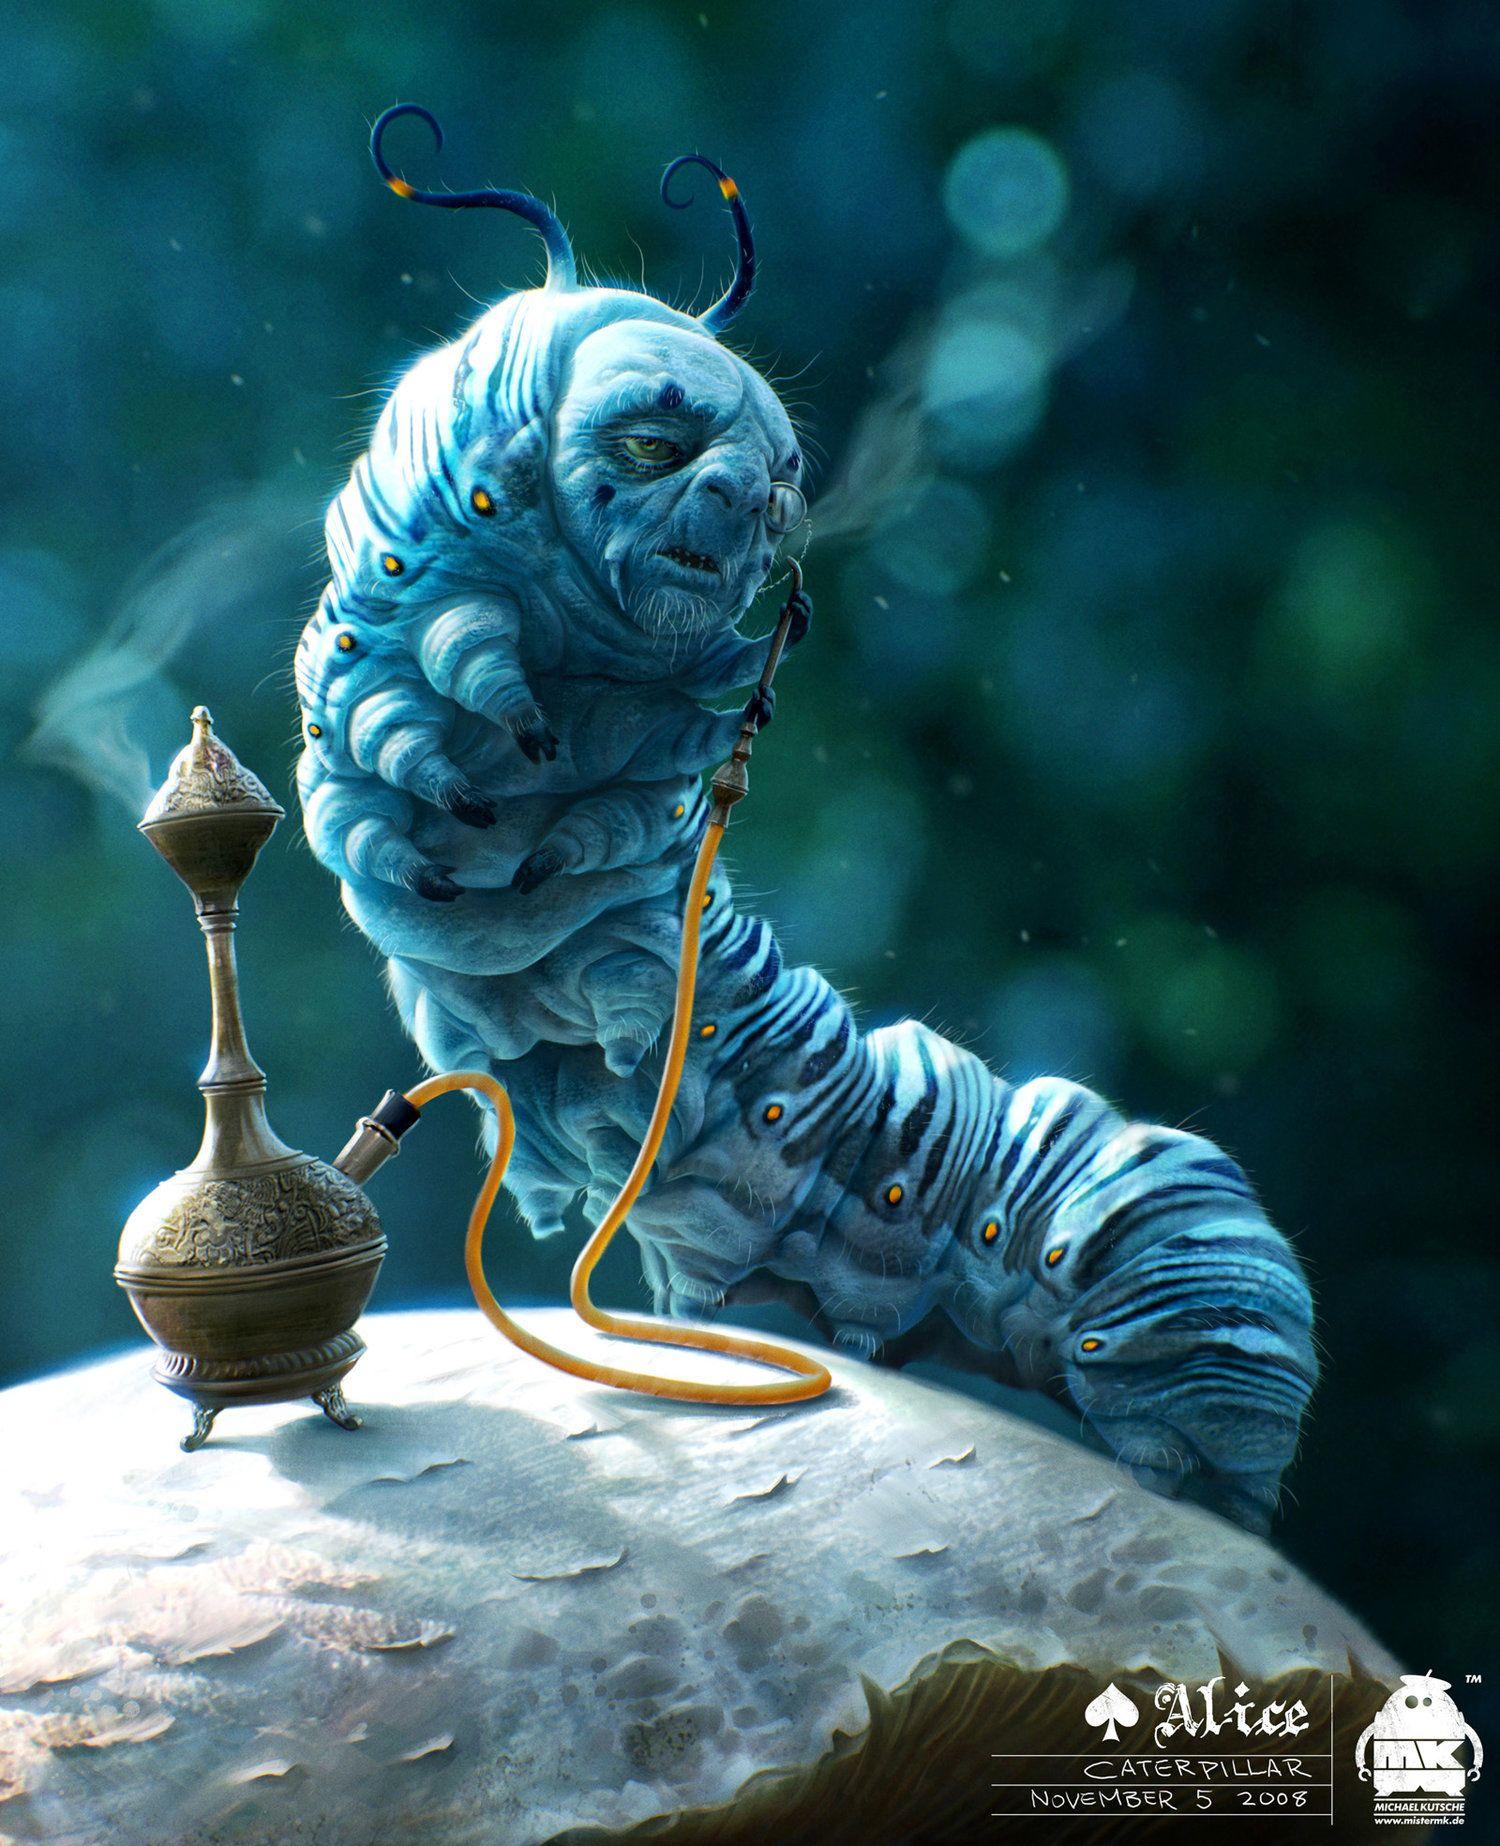 Caterpillar Concept C7 Jpg With Images Alice In Wonderland